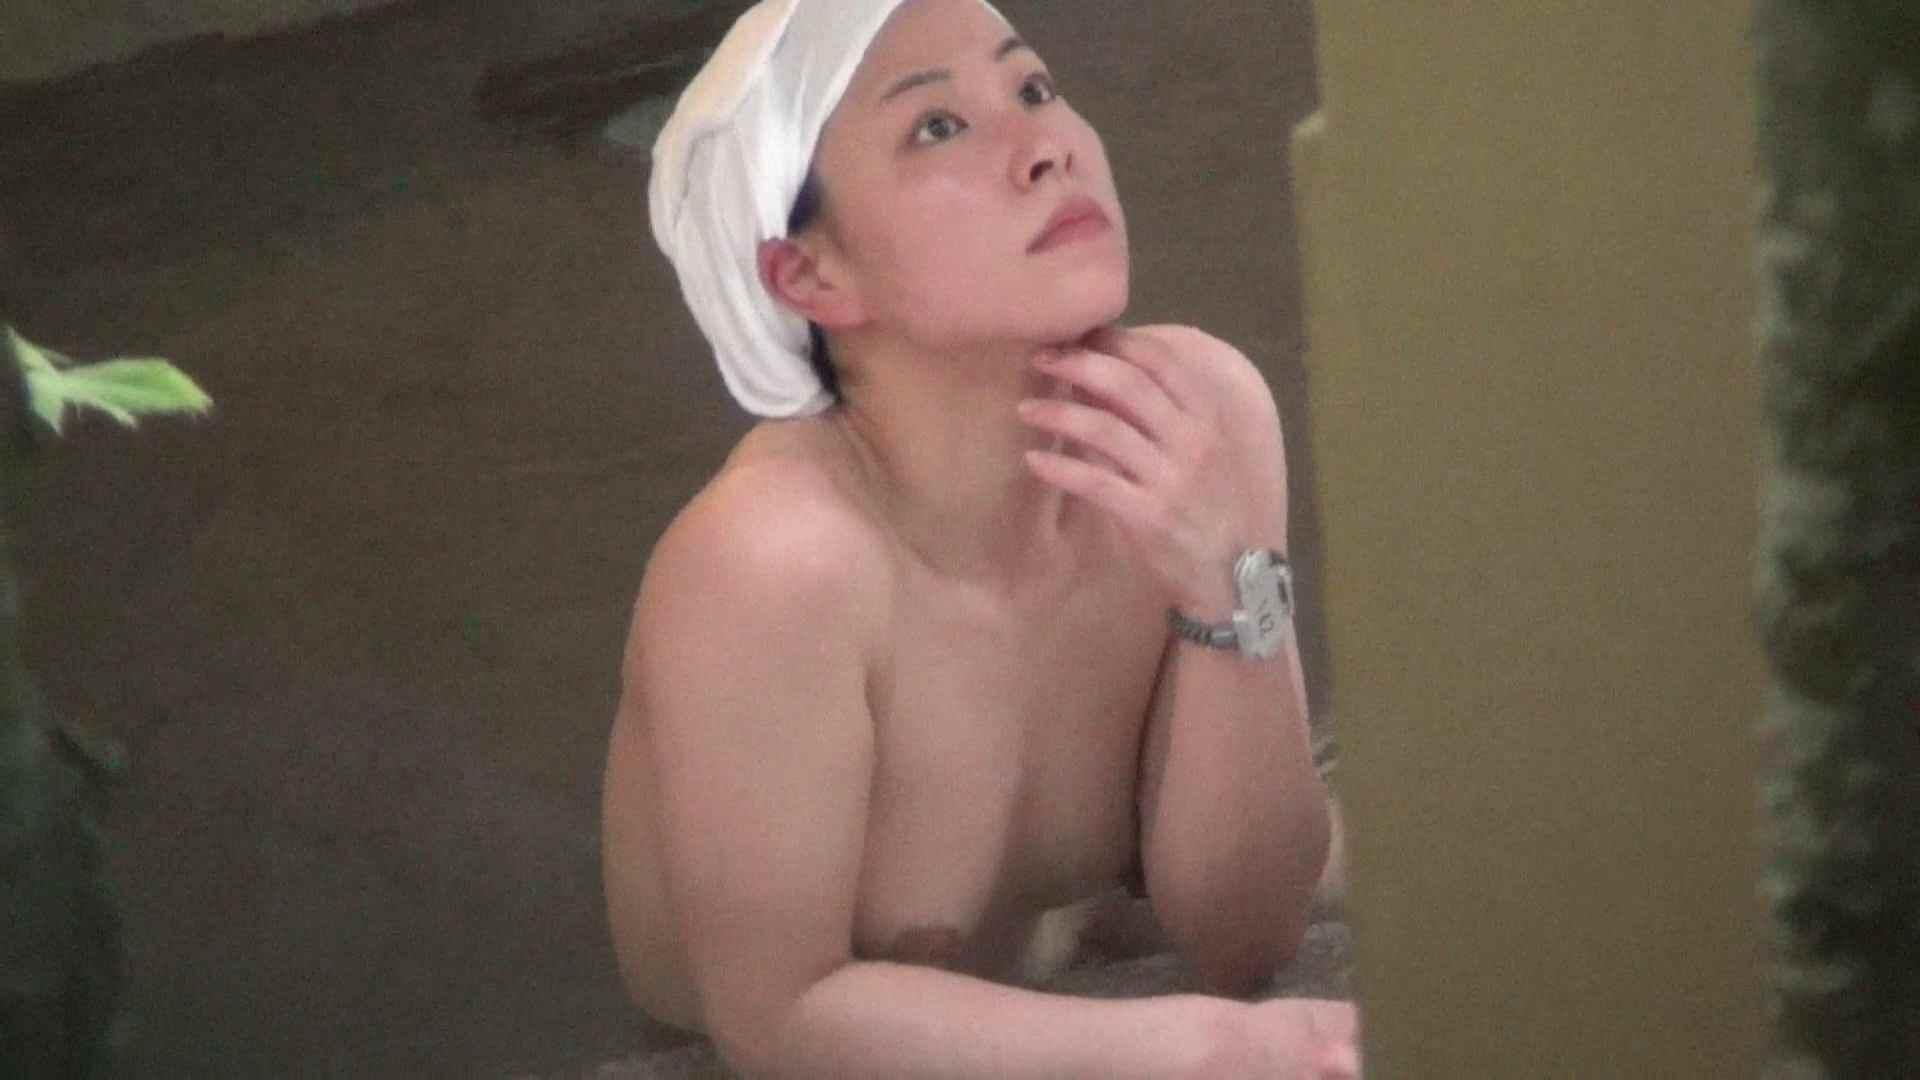 Aquaな露天風呂Vol.254 OLセックス  53画像 39